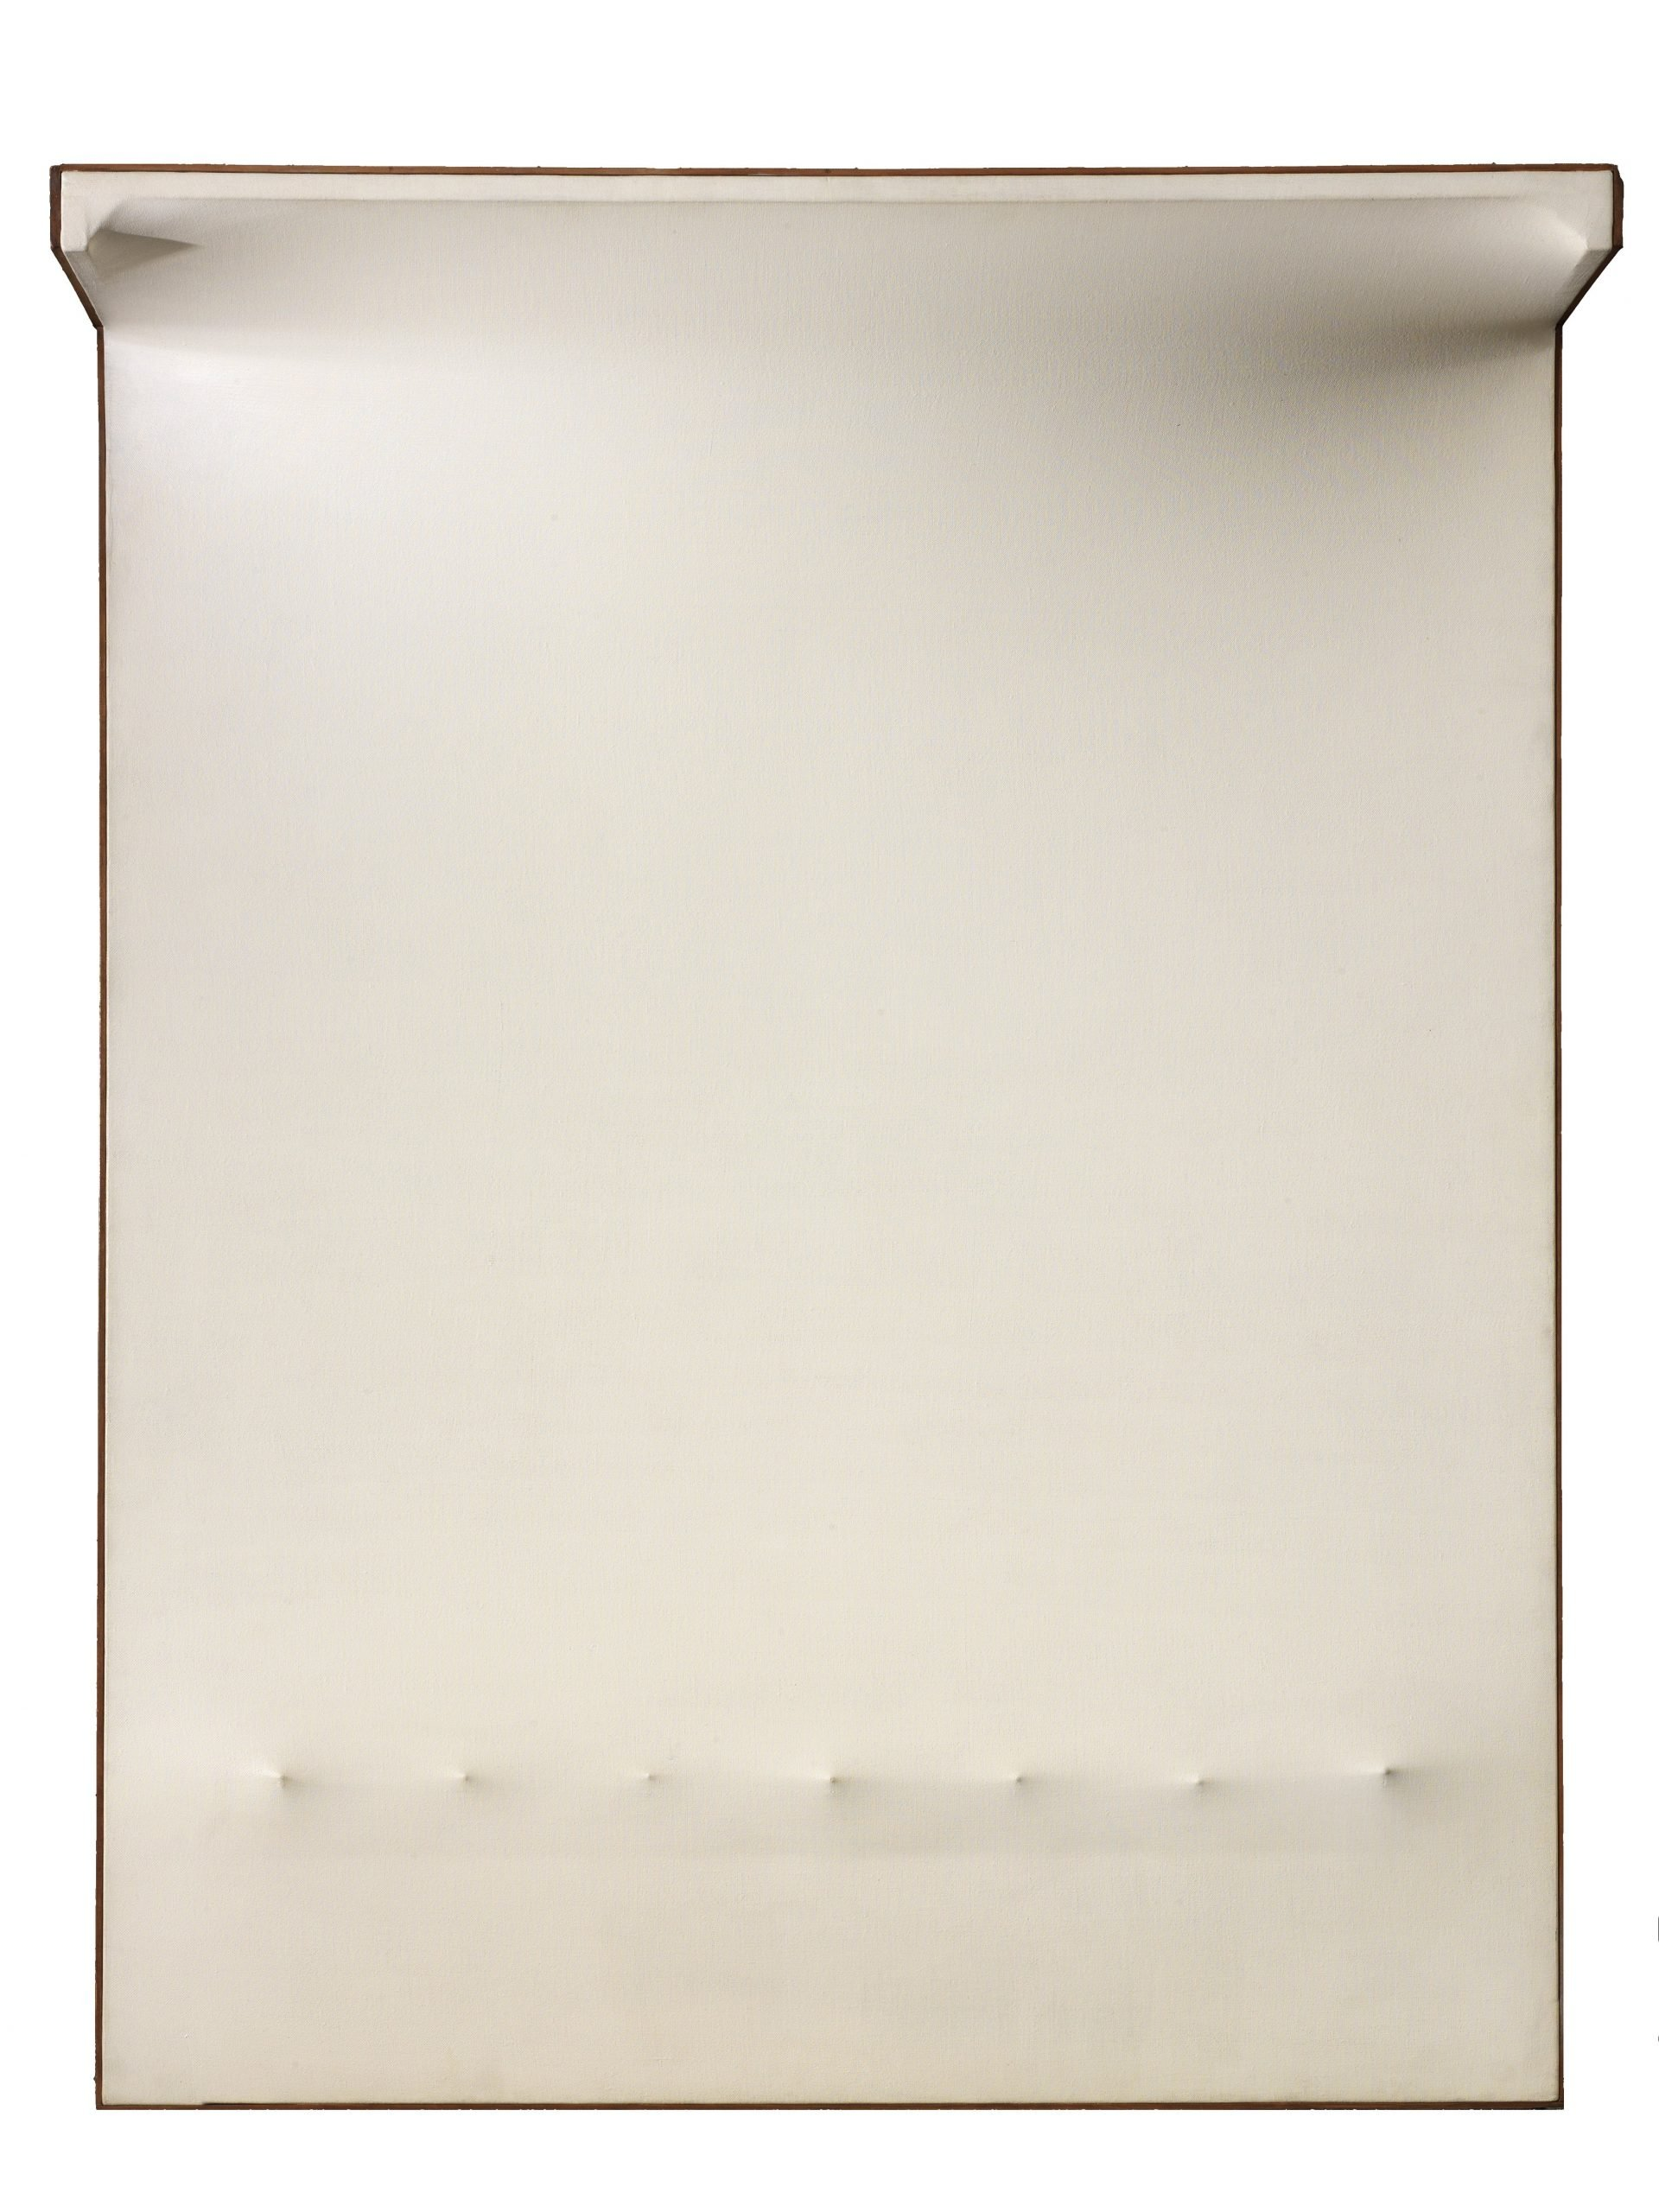 Enrico Castellani,  Superficie bianca n°5, 1964 tempera sur toile exoflexe 146 x 114 x 30 cm